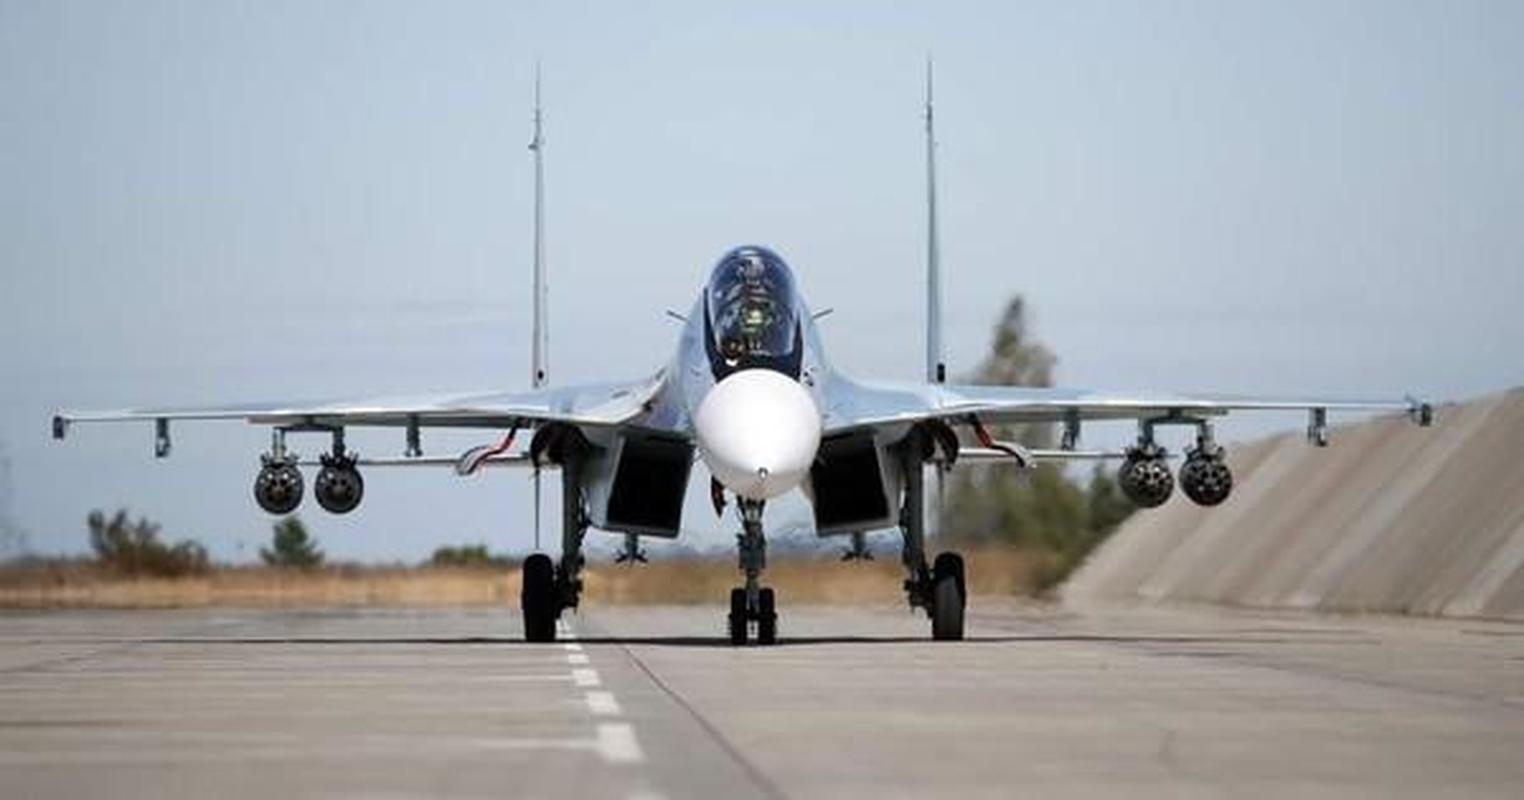 Su thuc Su-30SM2 Super Sukhoi sanh ngang tiem kich the he nam-Hinh-10